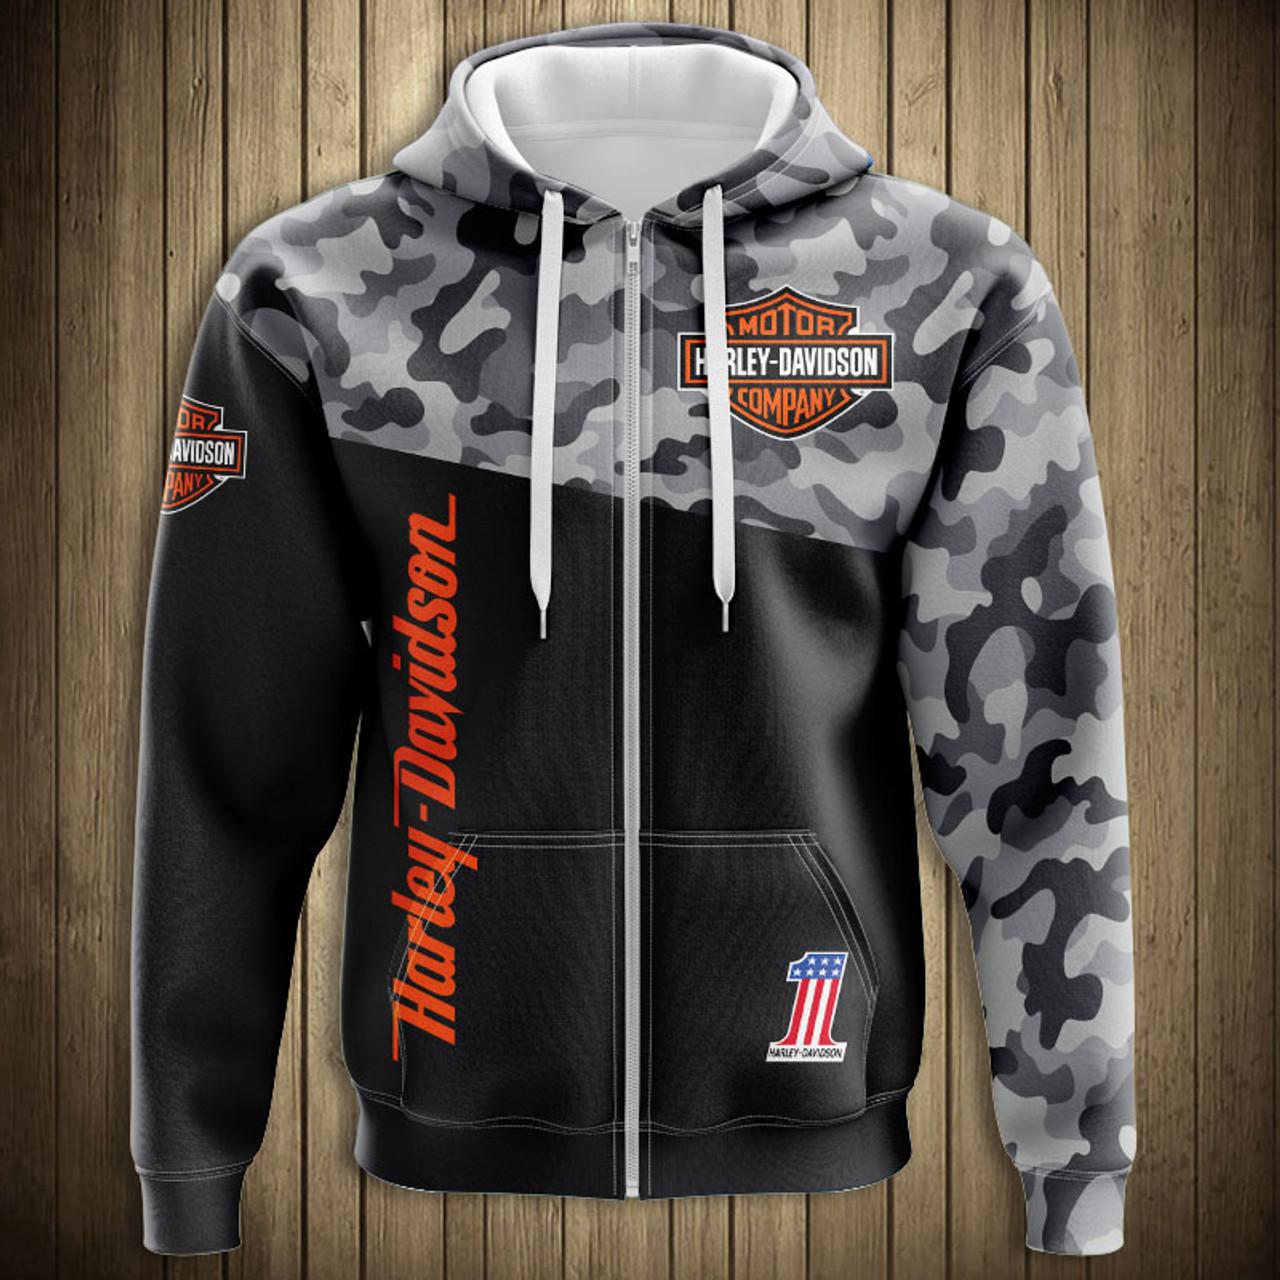 Mens 3D Print Graphic Harley Davidson Mens Sweatpants with Pocket